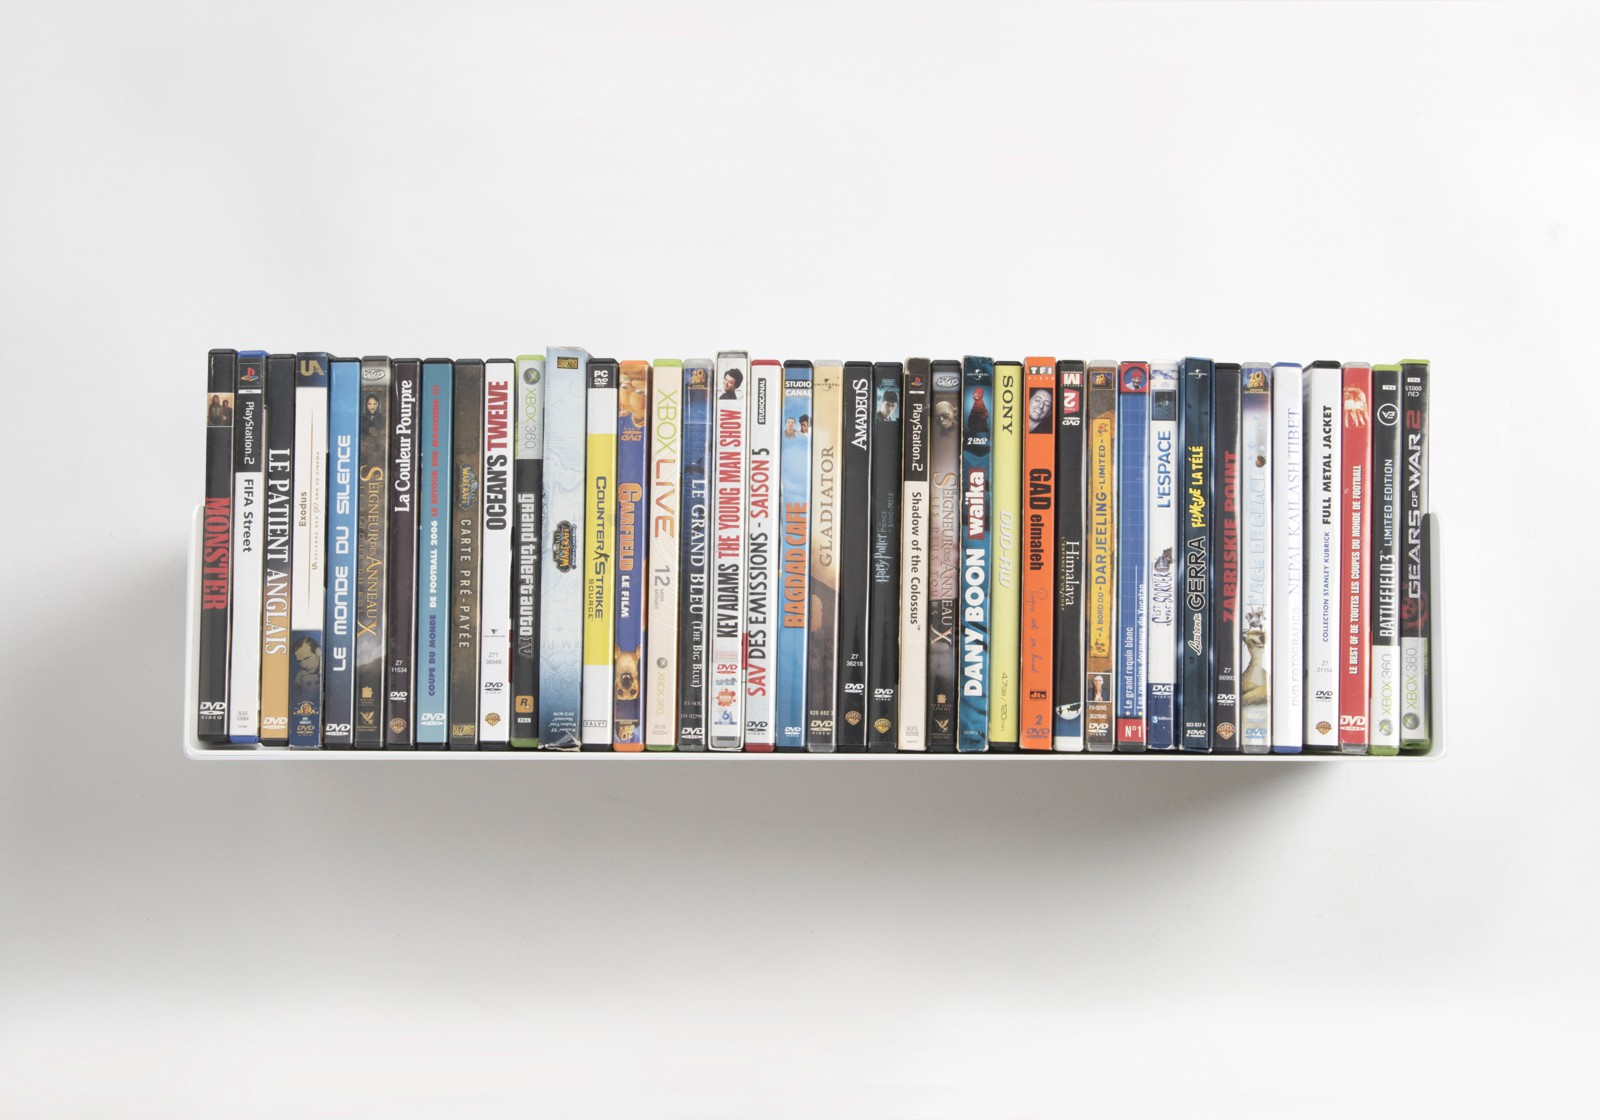 Dvd shelves dvd shelving unit by teebooks teebooks dvd wall shelf udvd 60  cm amipublicfo Image